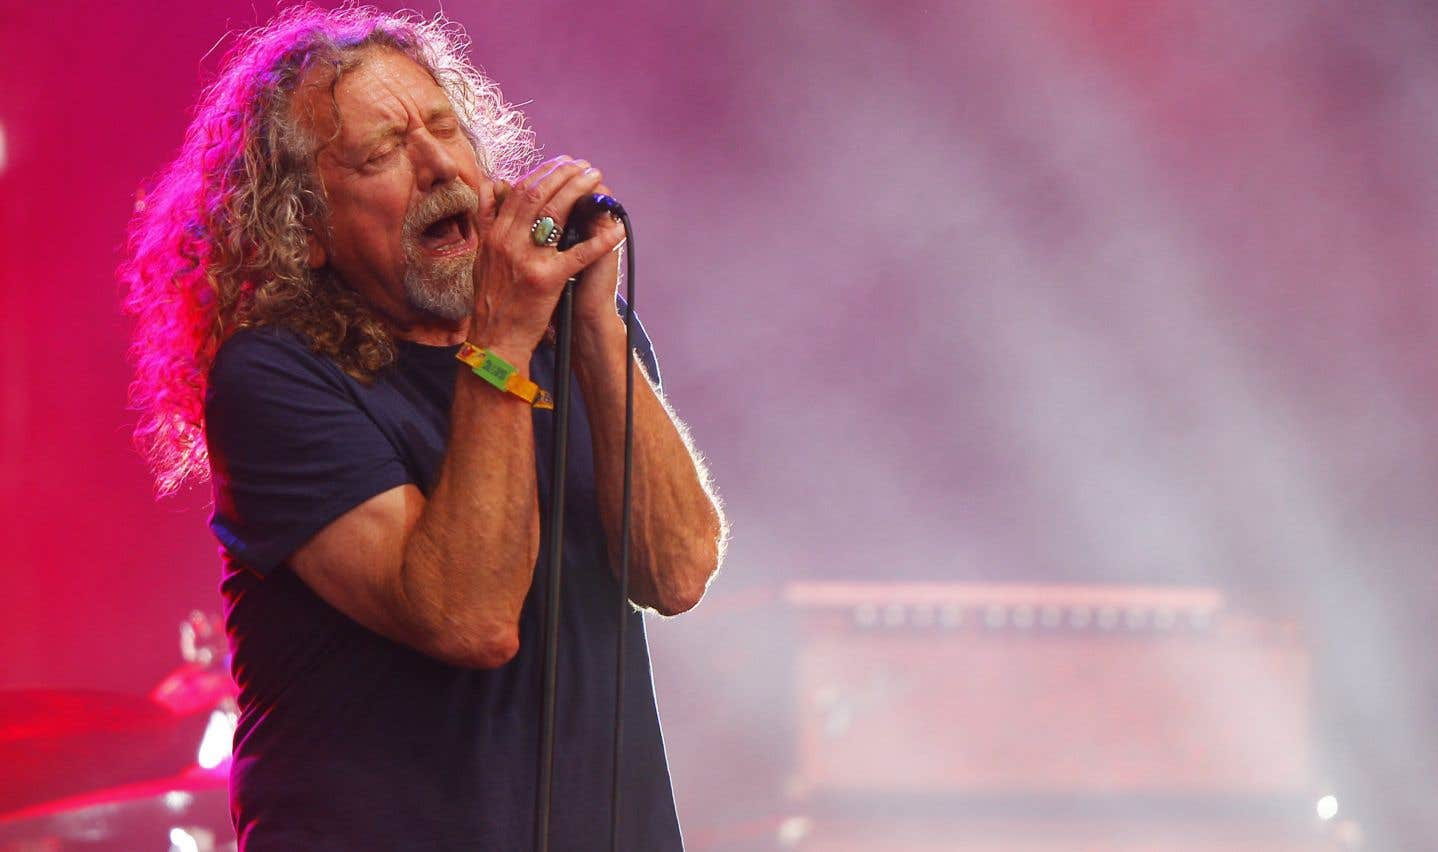 Robert Plant au festival Bonnaroo en 2015